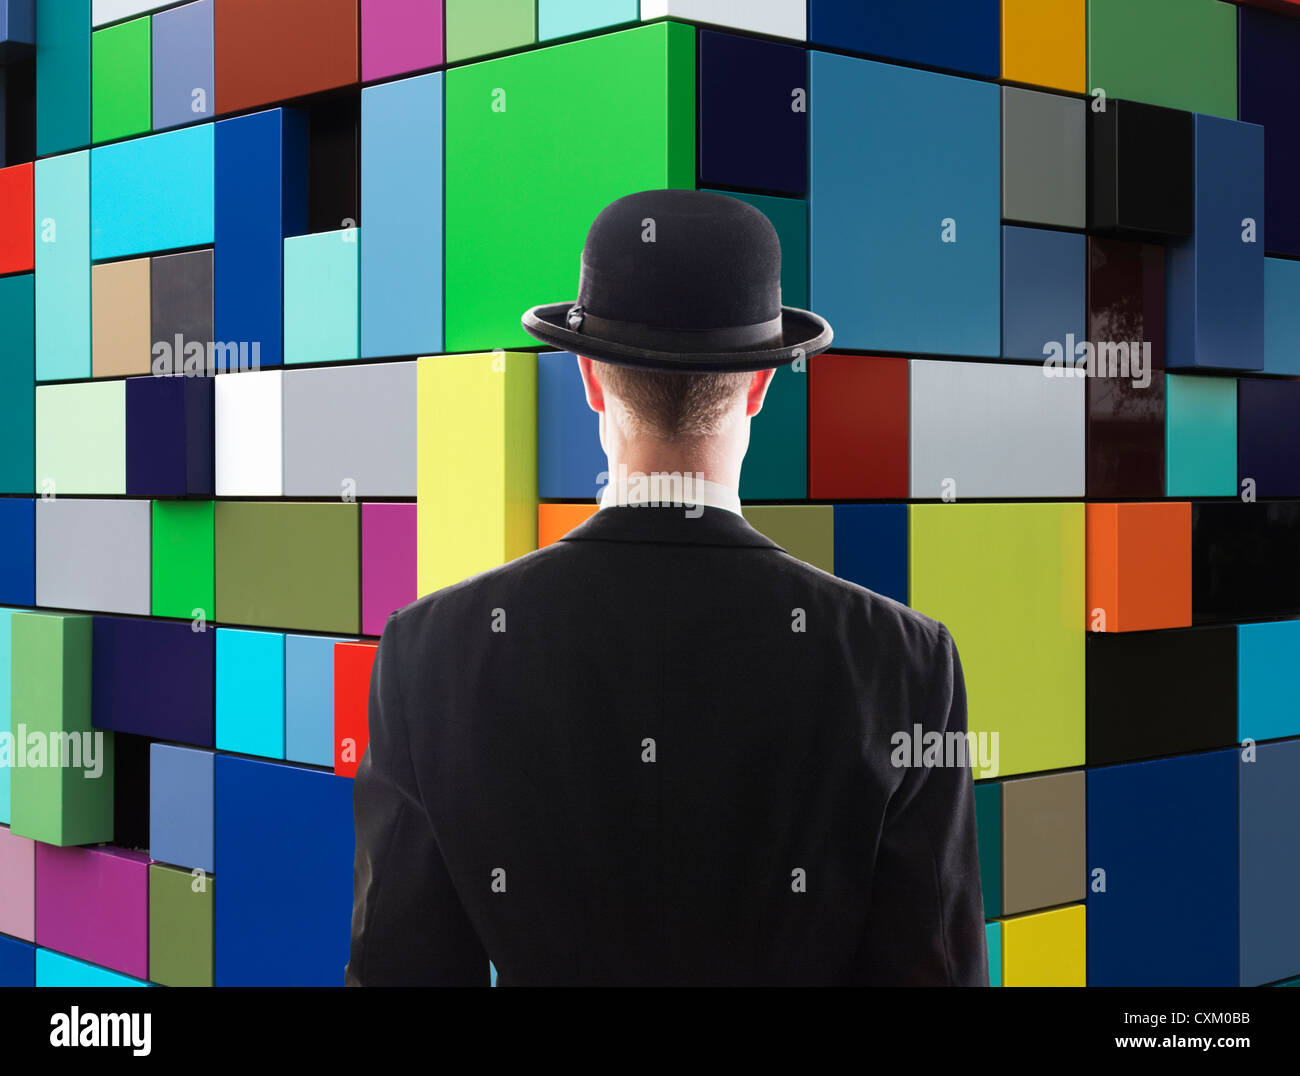 man facing multi-colored wall - Stock Image